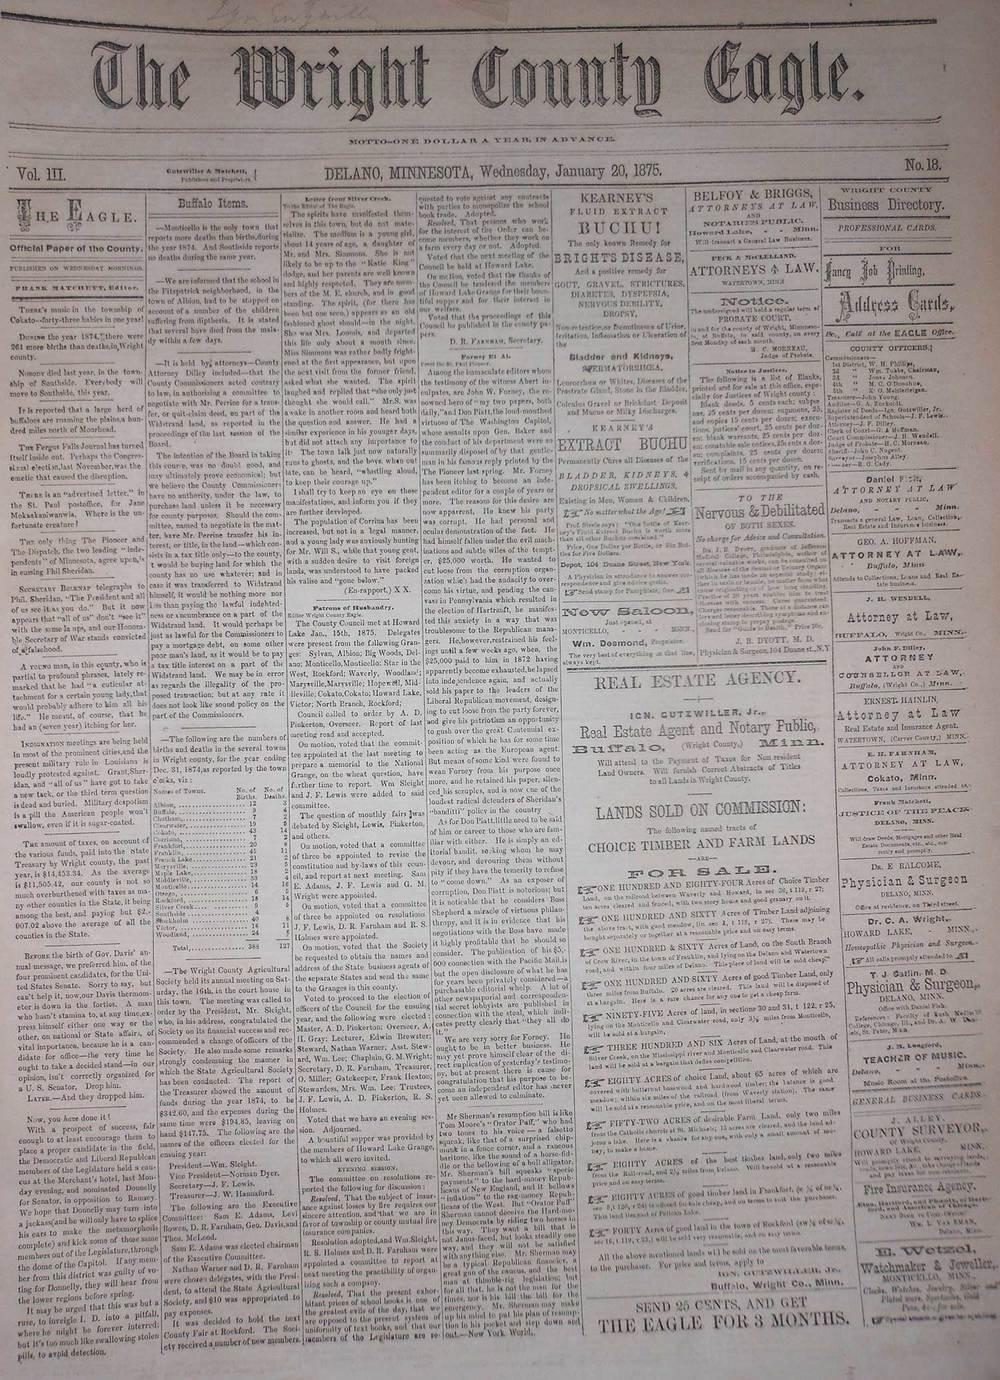 1/20/1875, p1